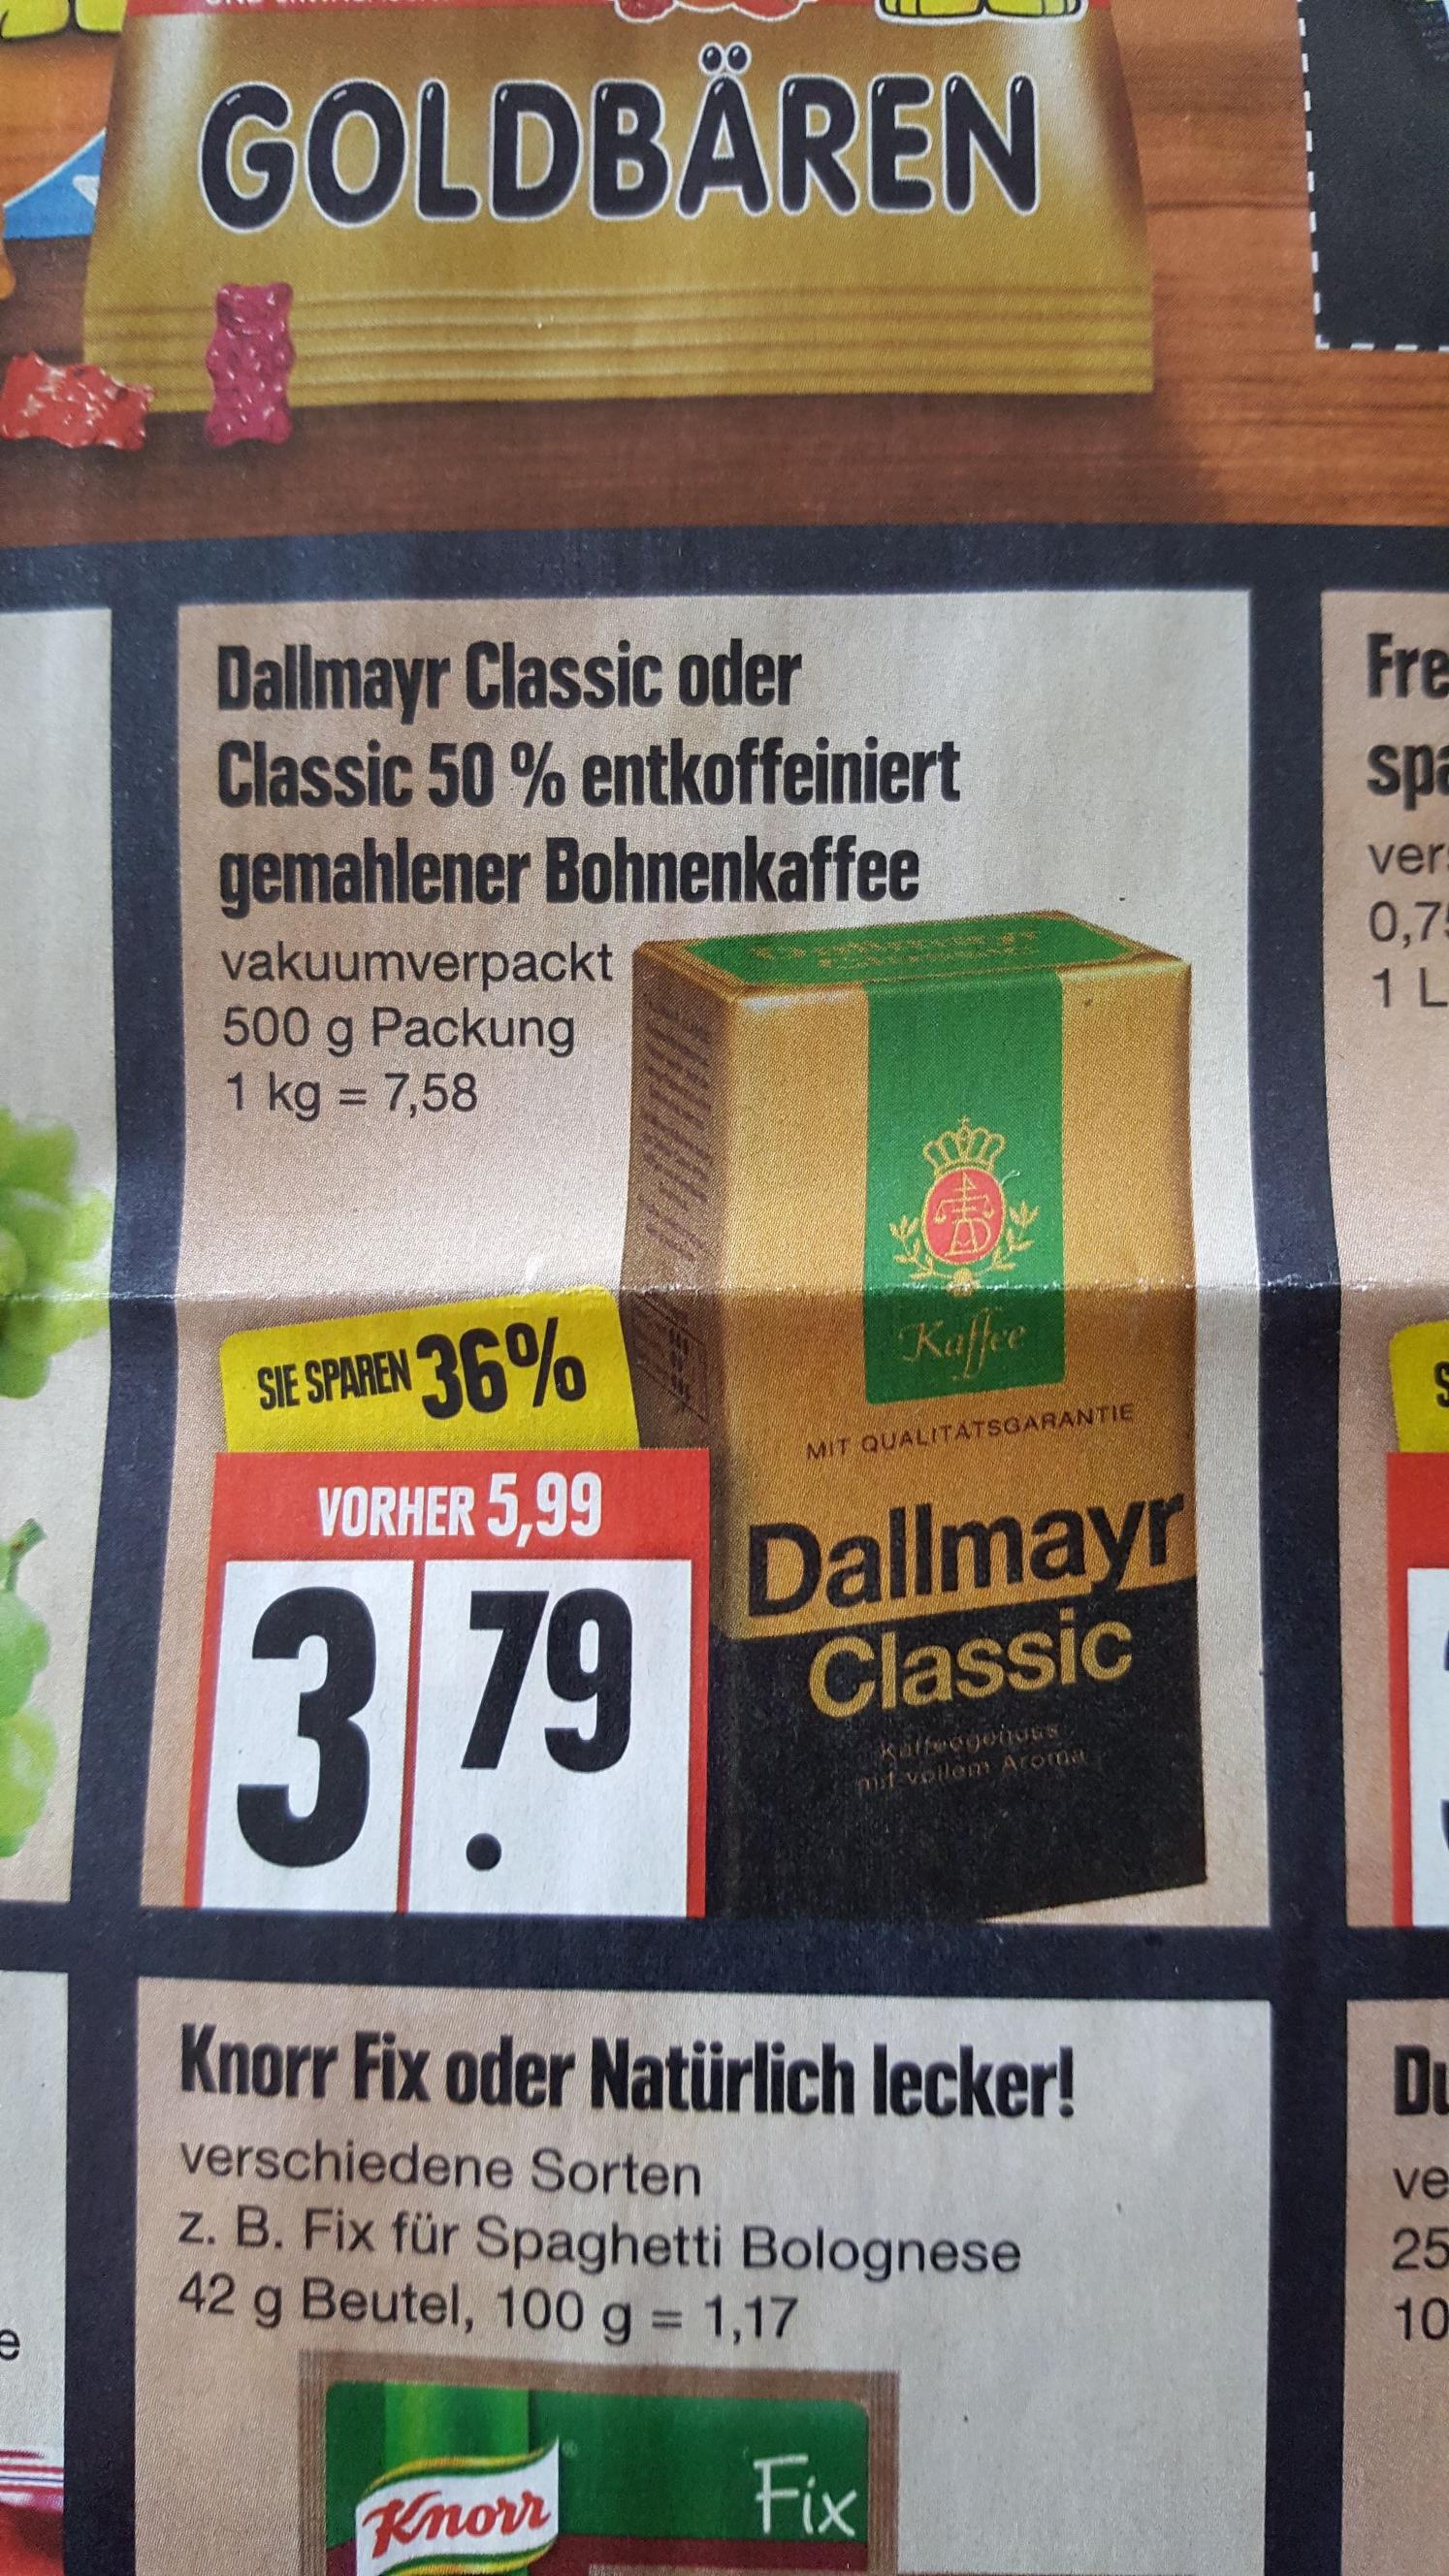 [EDEKA] Dallmayr Classic Kaffee 500g - bundesweit ab 12.3.